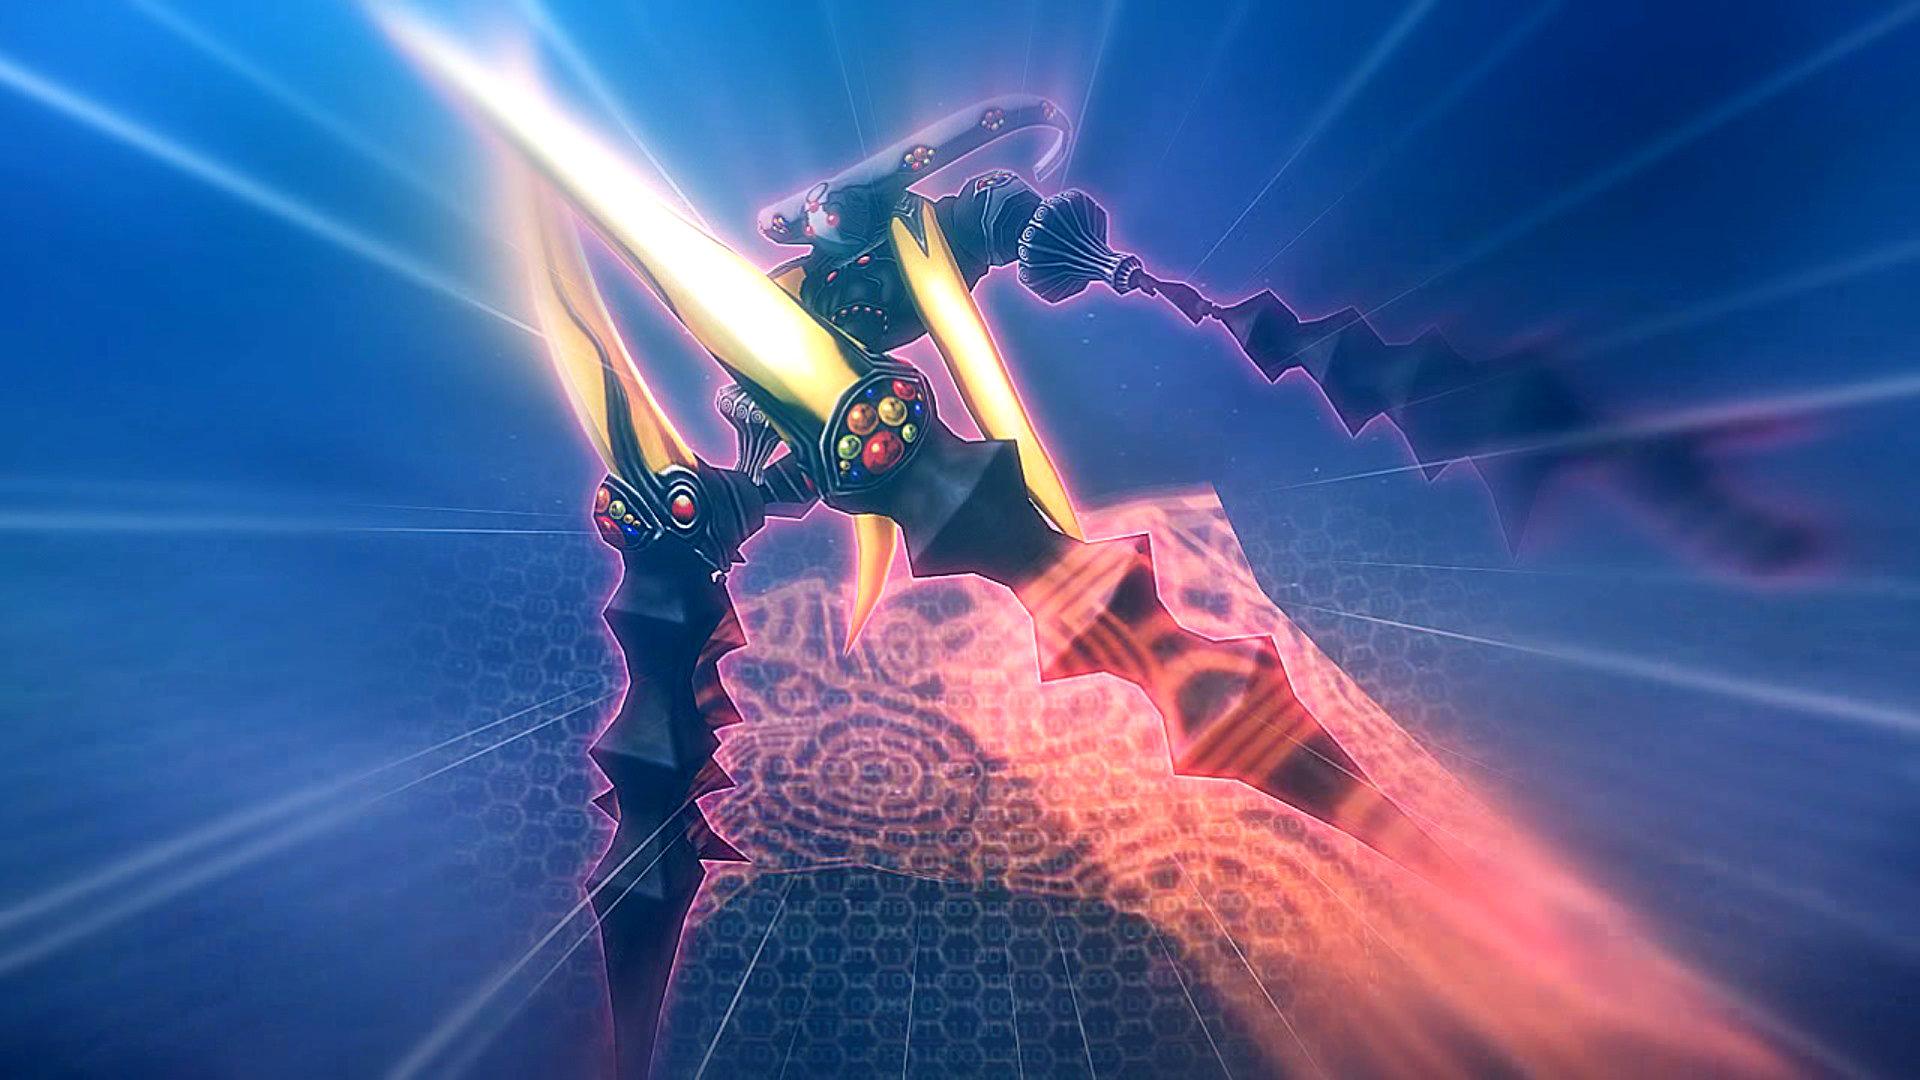 Hack G U Last Recode Game Ps4 Playstation